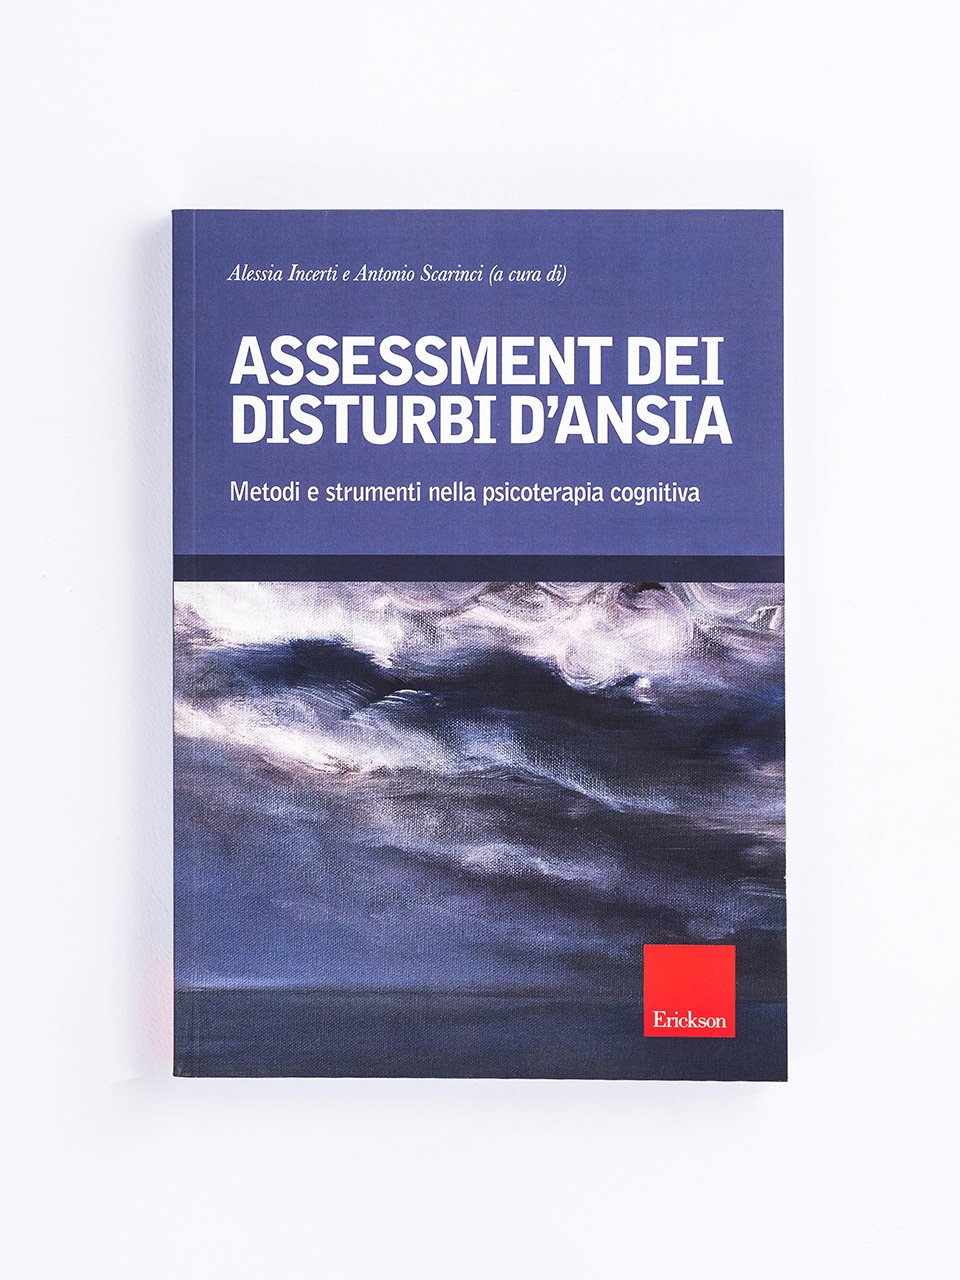 Assessment dei disturbi d'ansia - Come vincere l'ansia sociale - Libri - Erickson